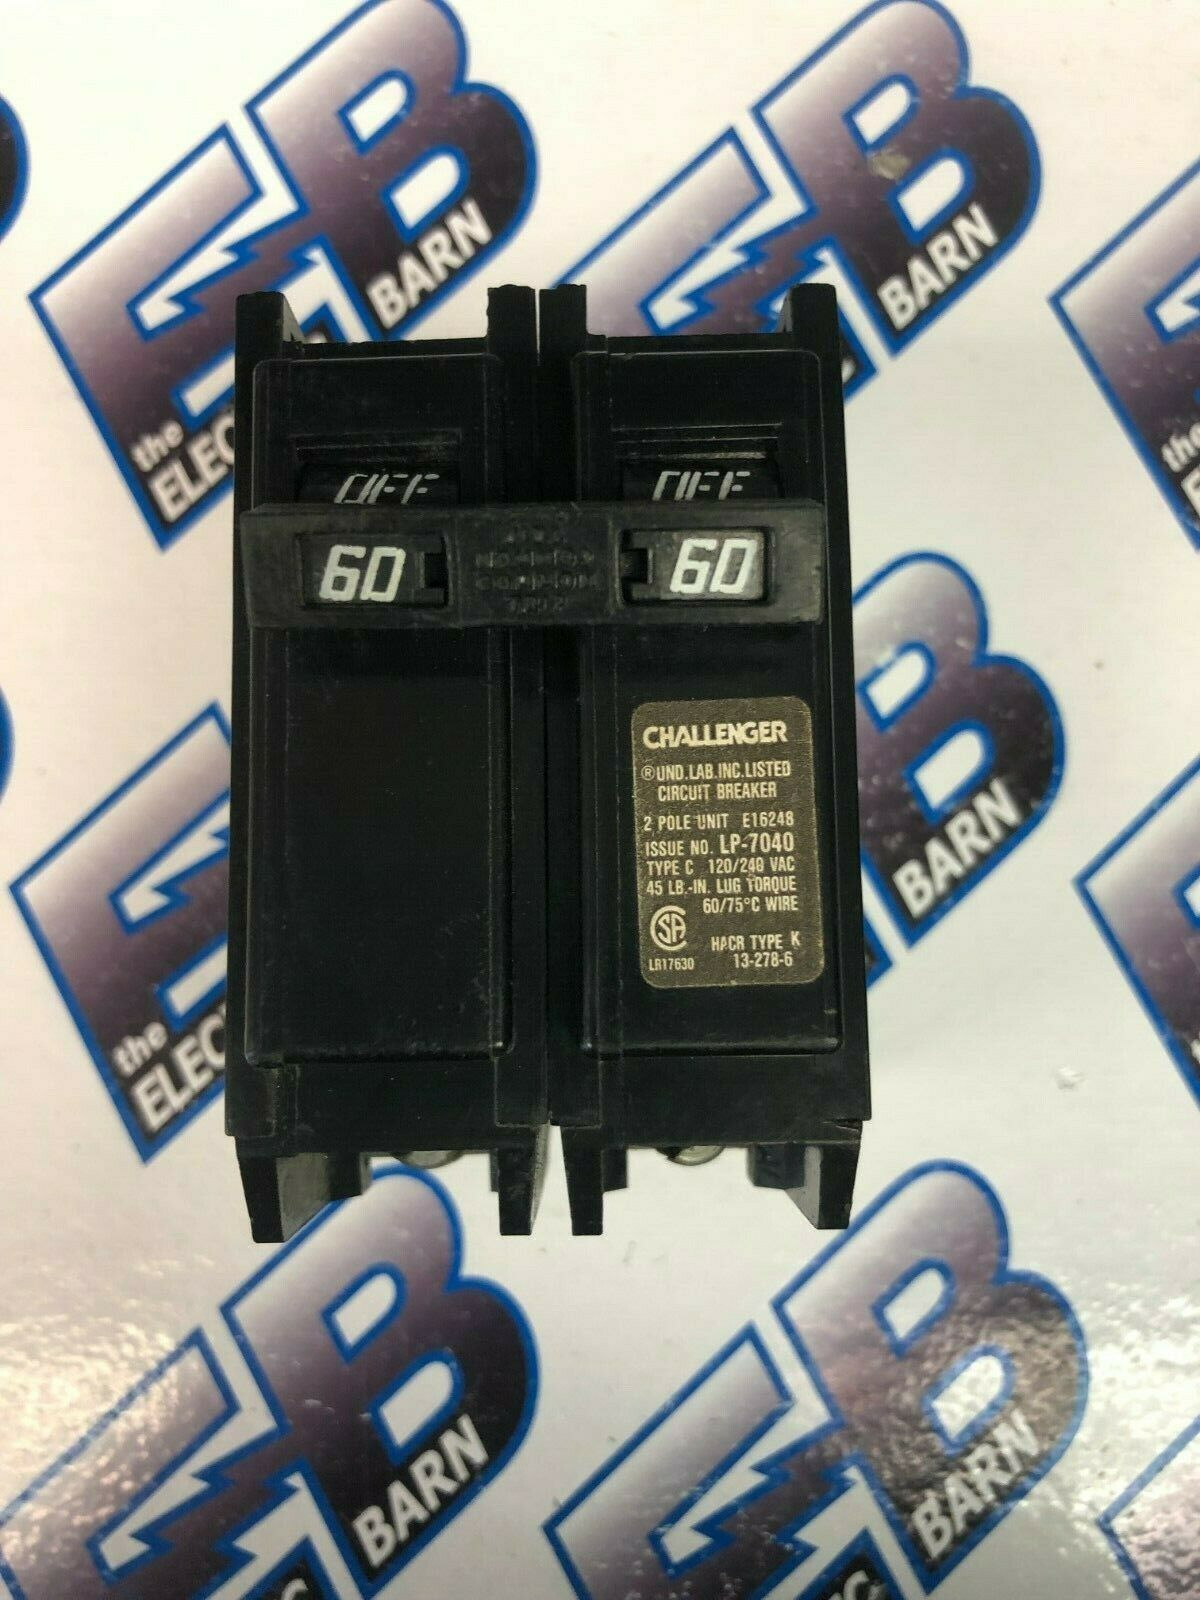 hight resolution of challenger type c260 circuit breaker 2 pole 60 amp for sale online ebay